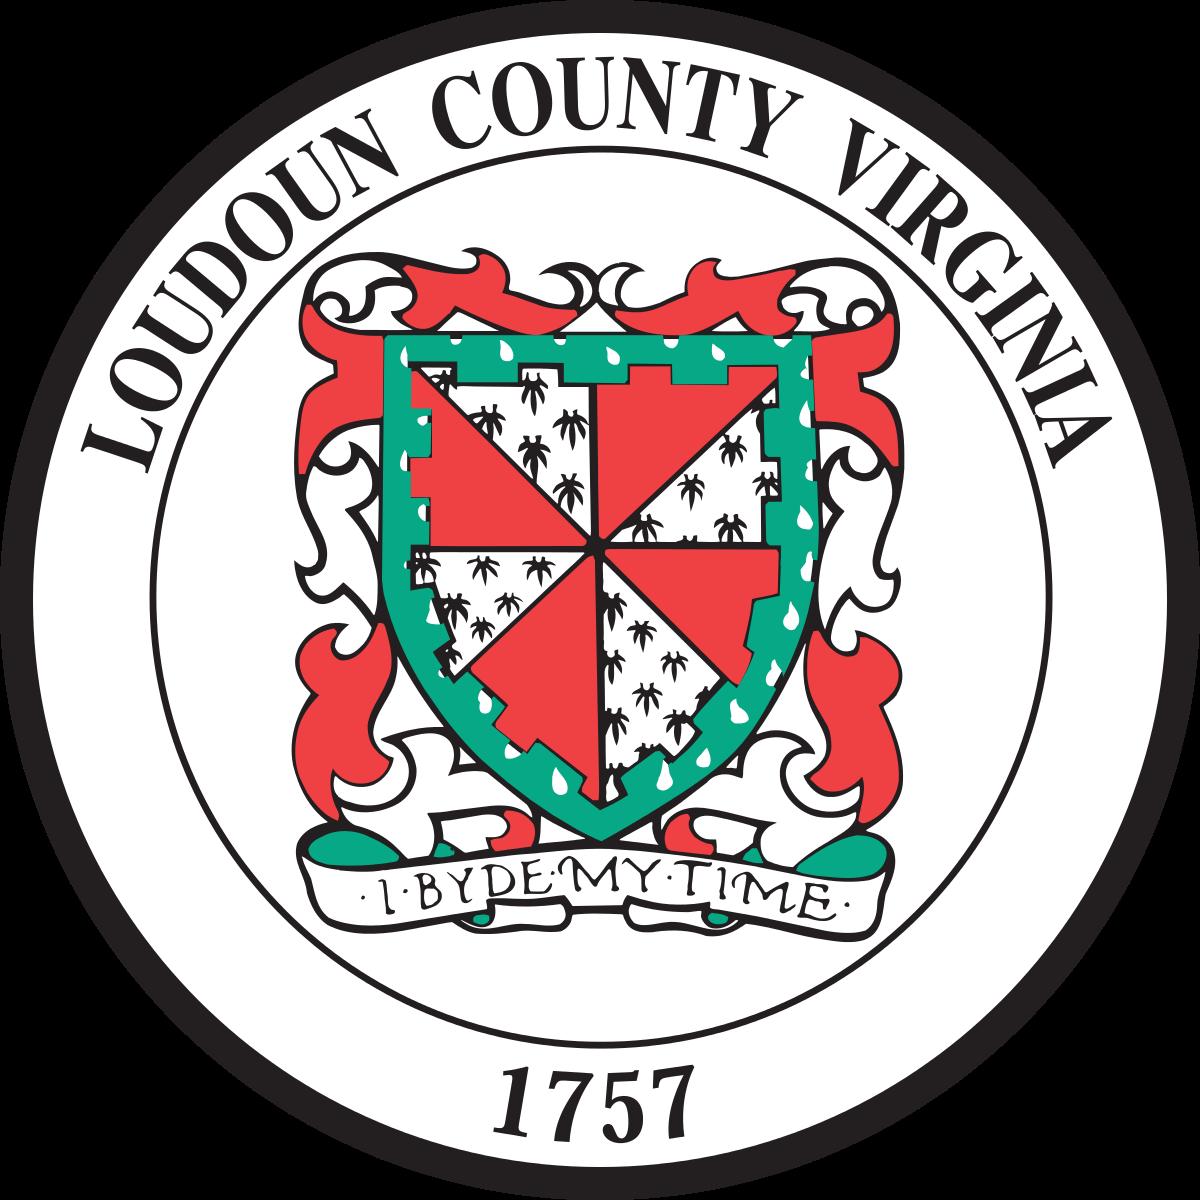 Loudoun County